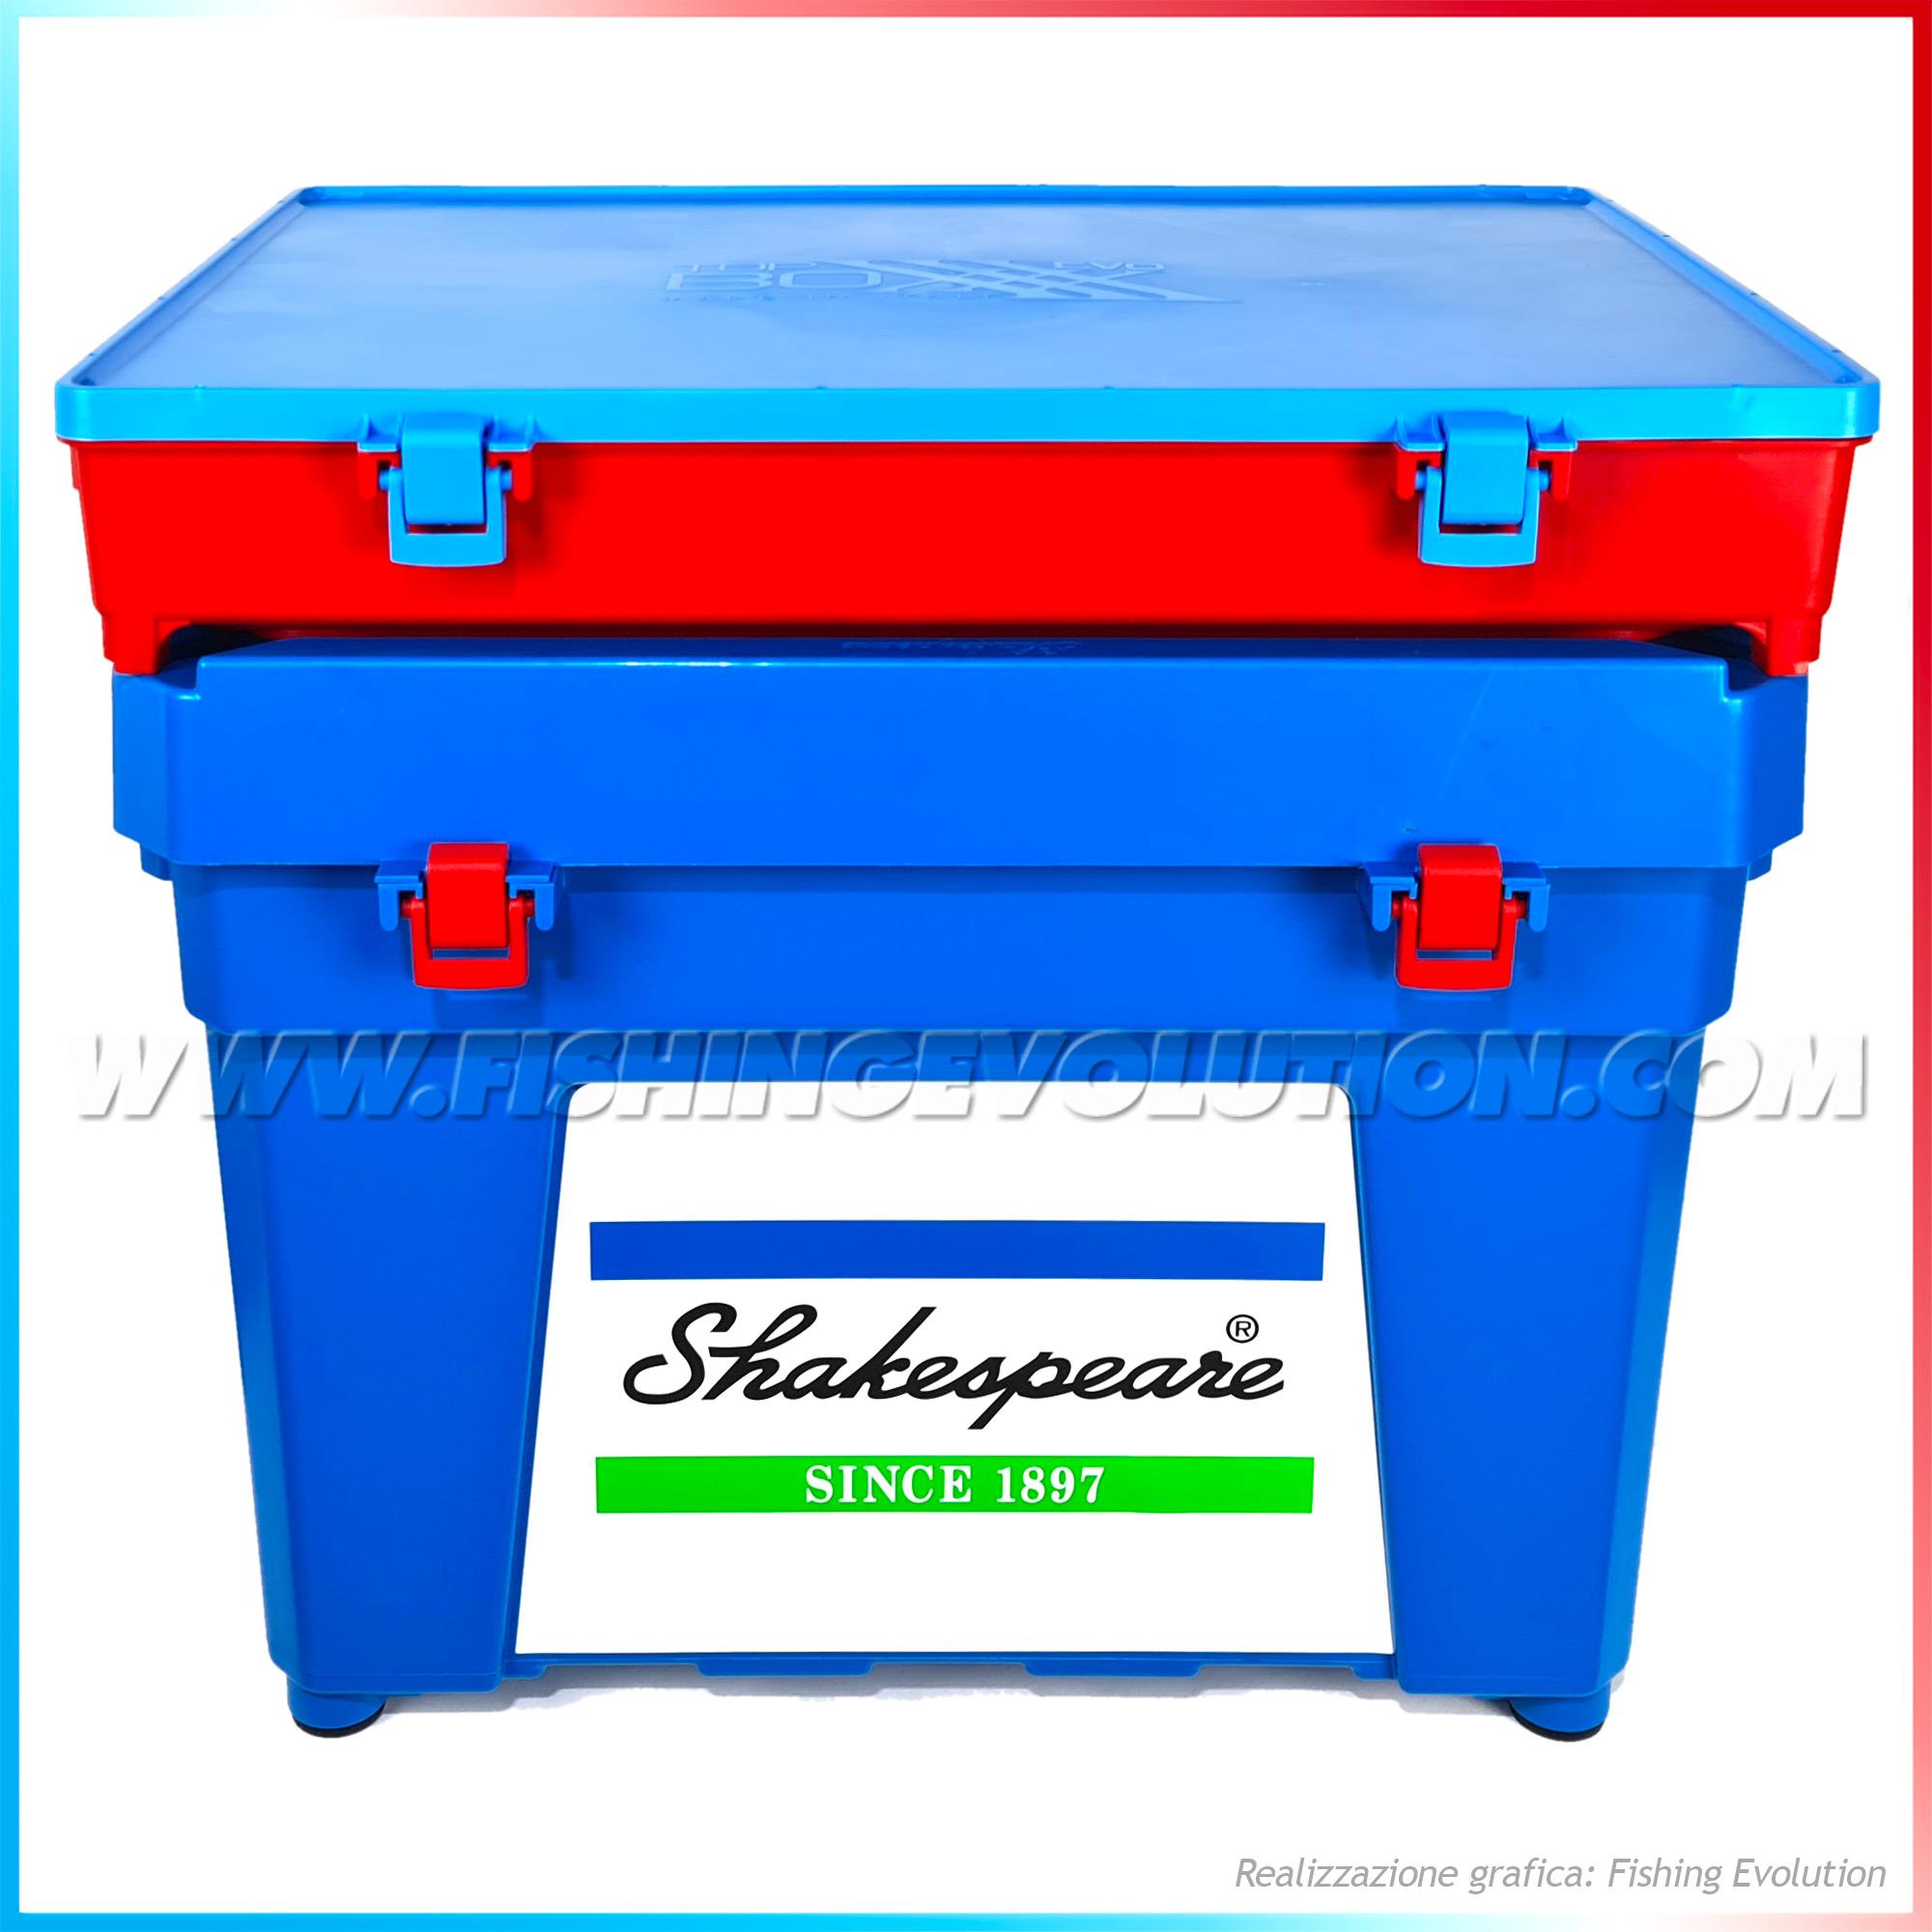 SkpBluTboxxx4.jpg